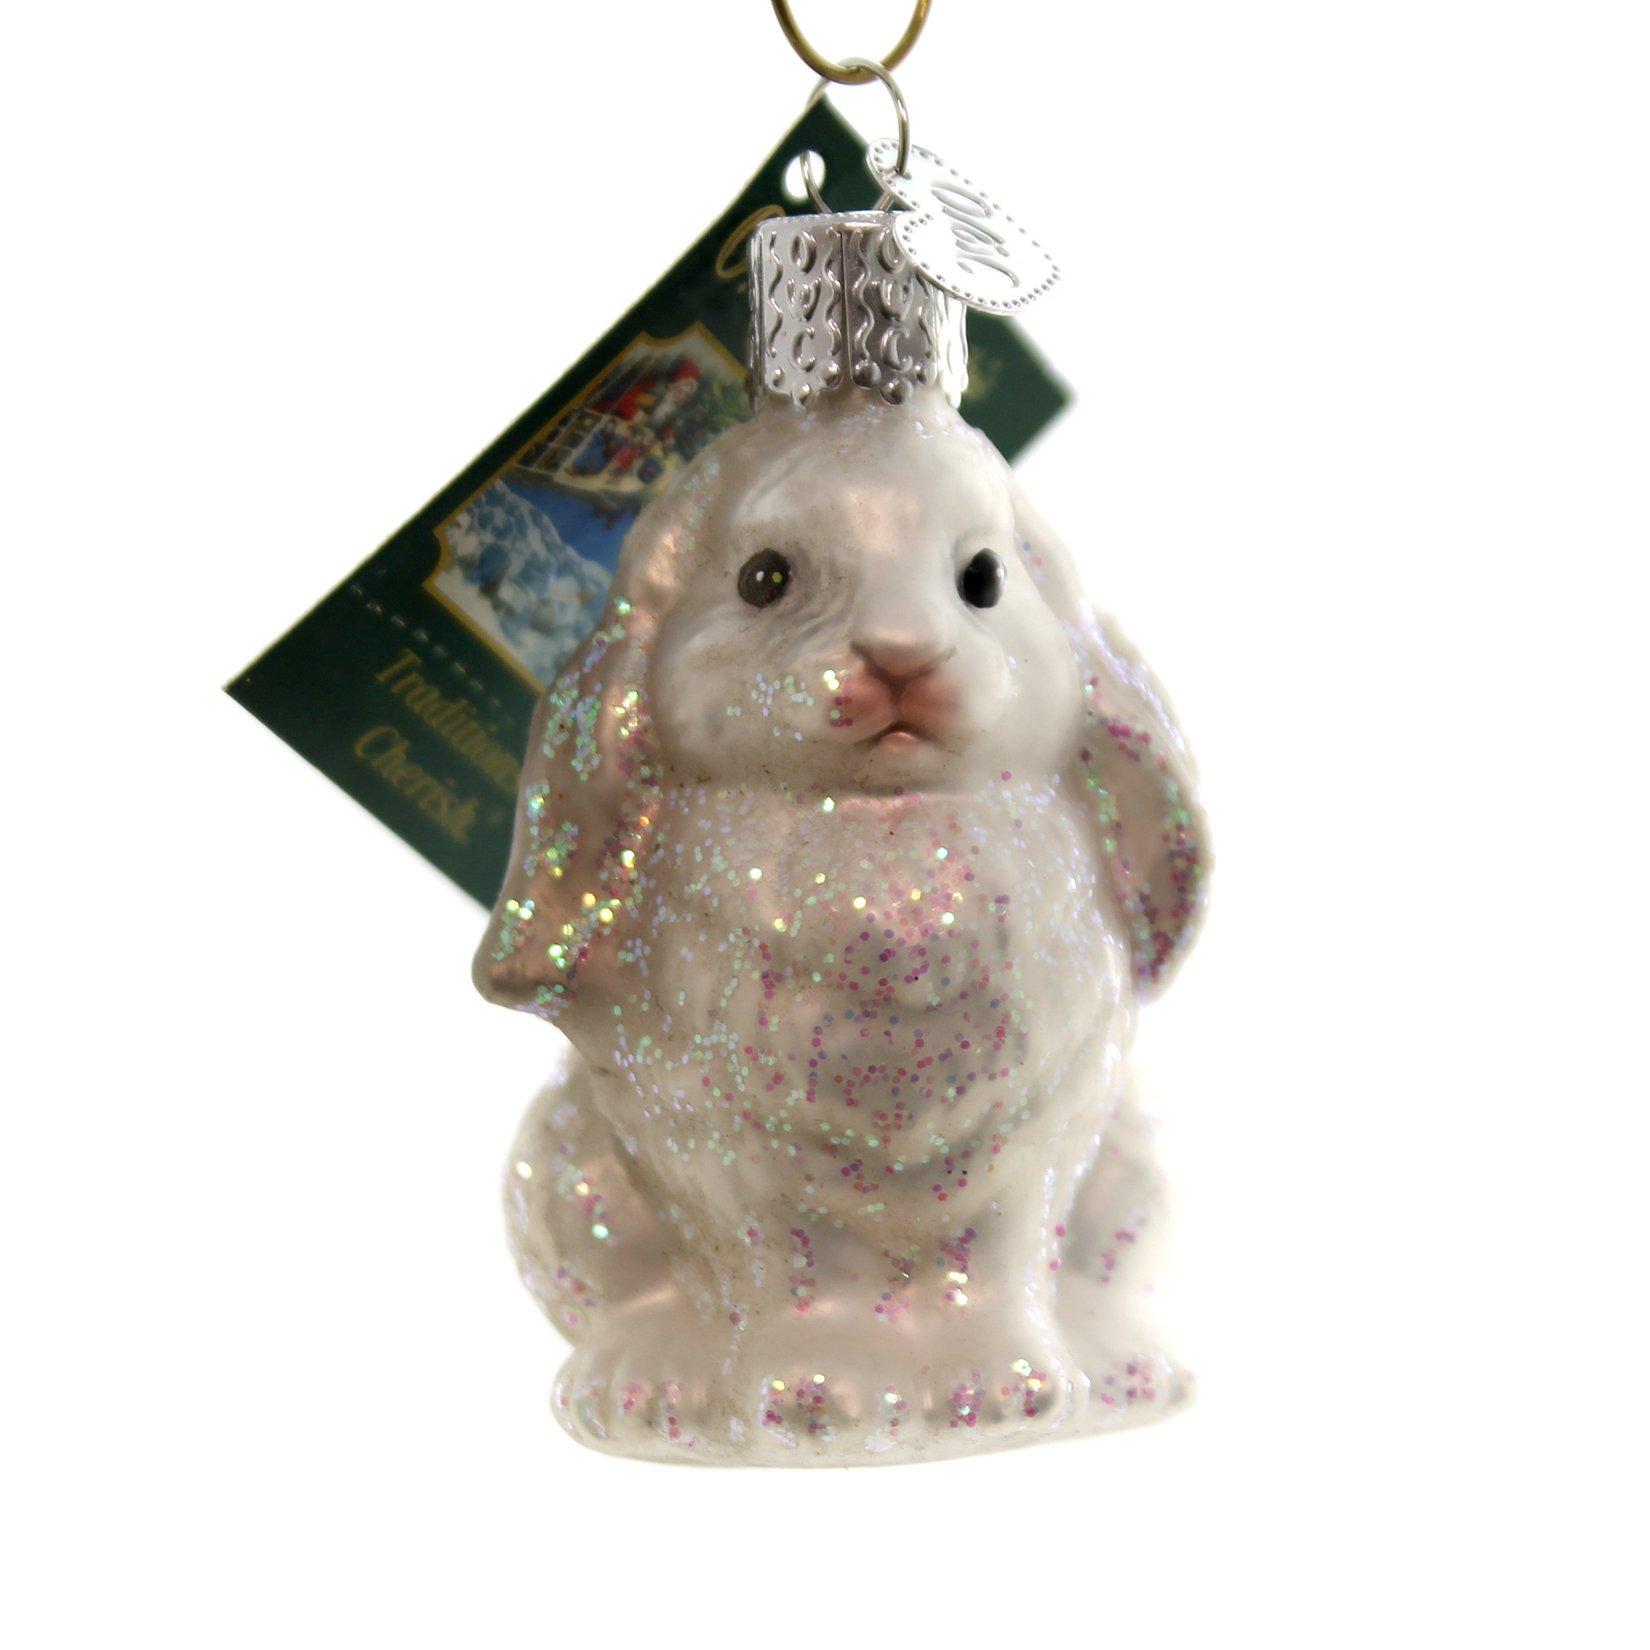 Old World Christmas BABY BUNNY Glass Rabbit Ornament 12365 White